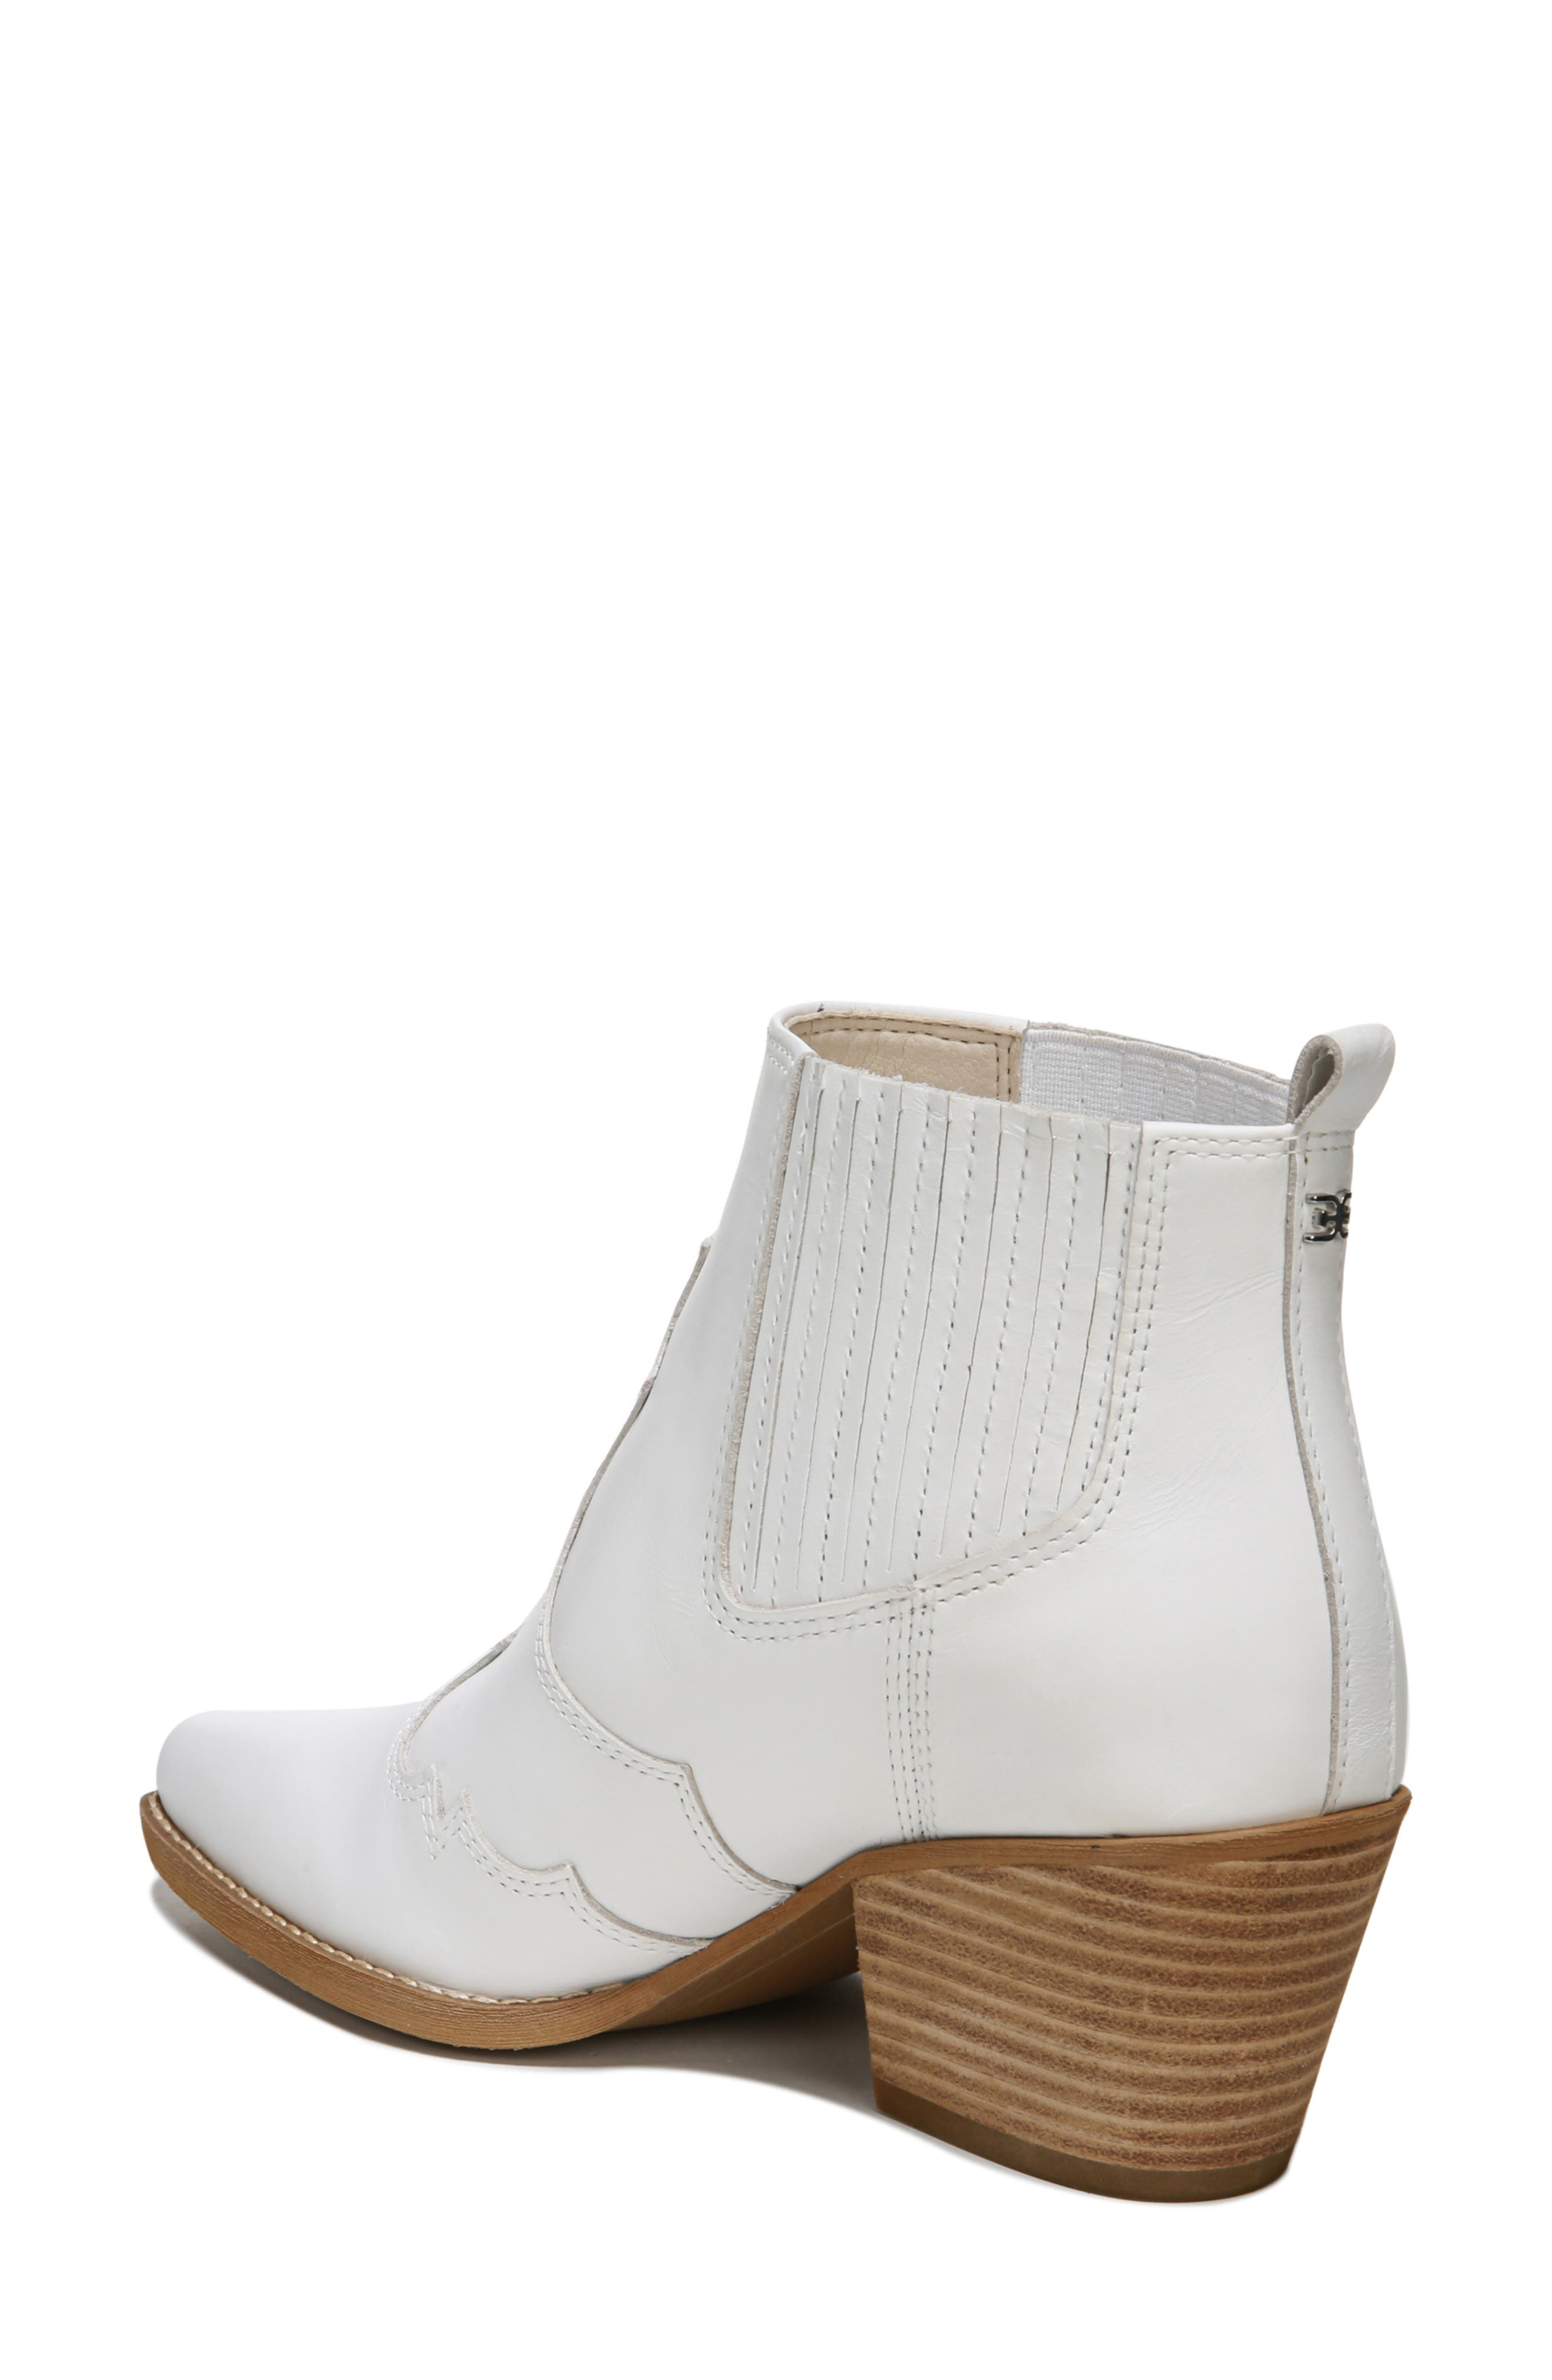 153d82e025b71 Women s Sam Edelman Booties   Ankle Boots